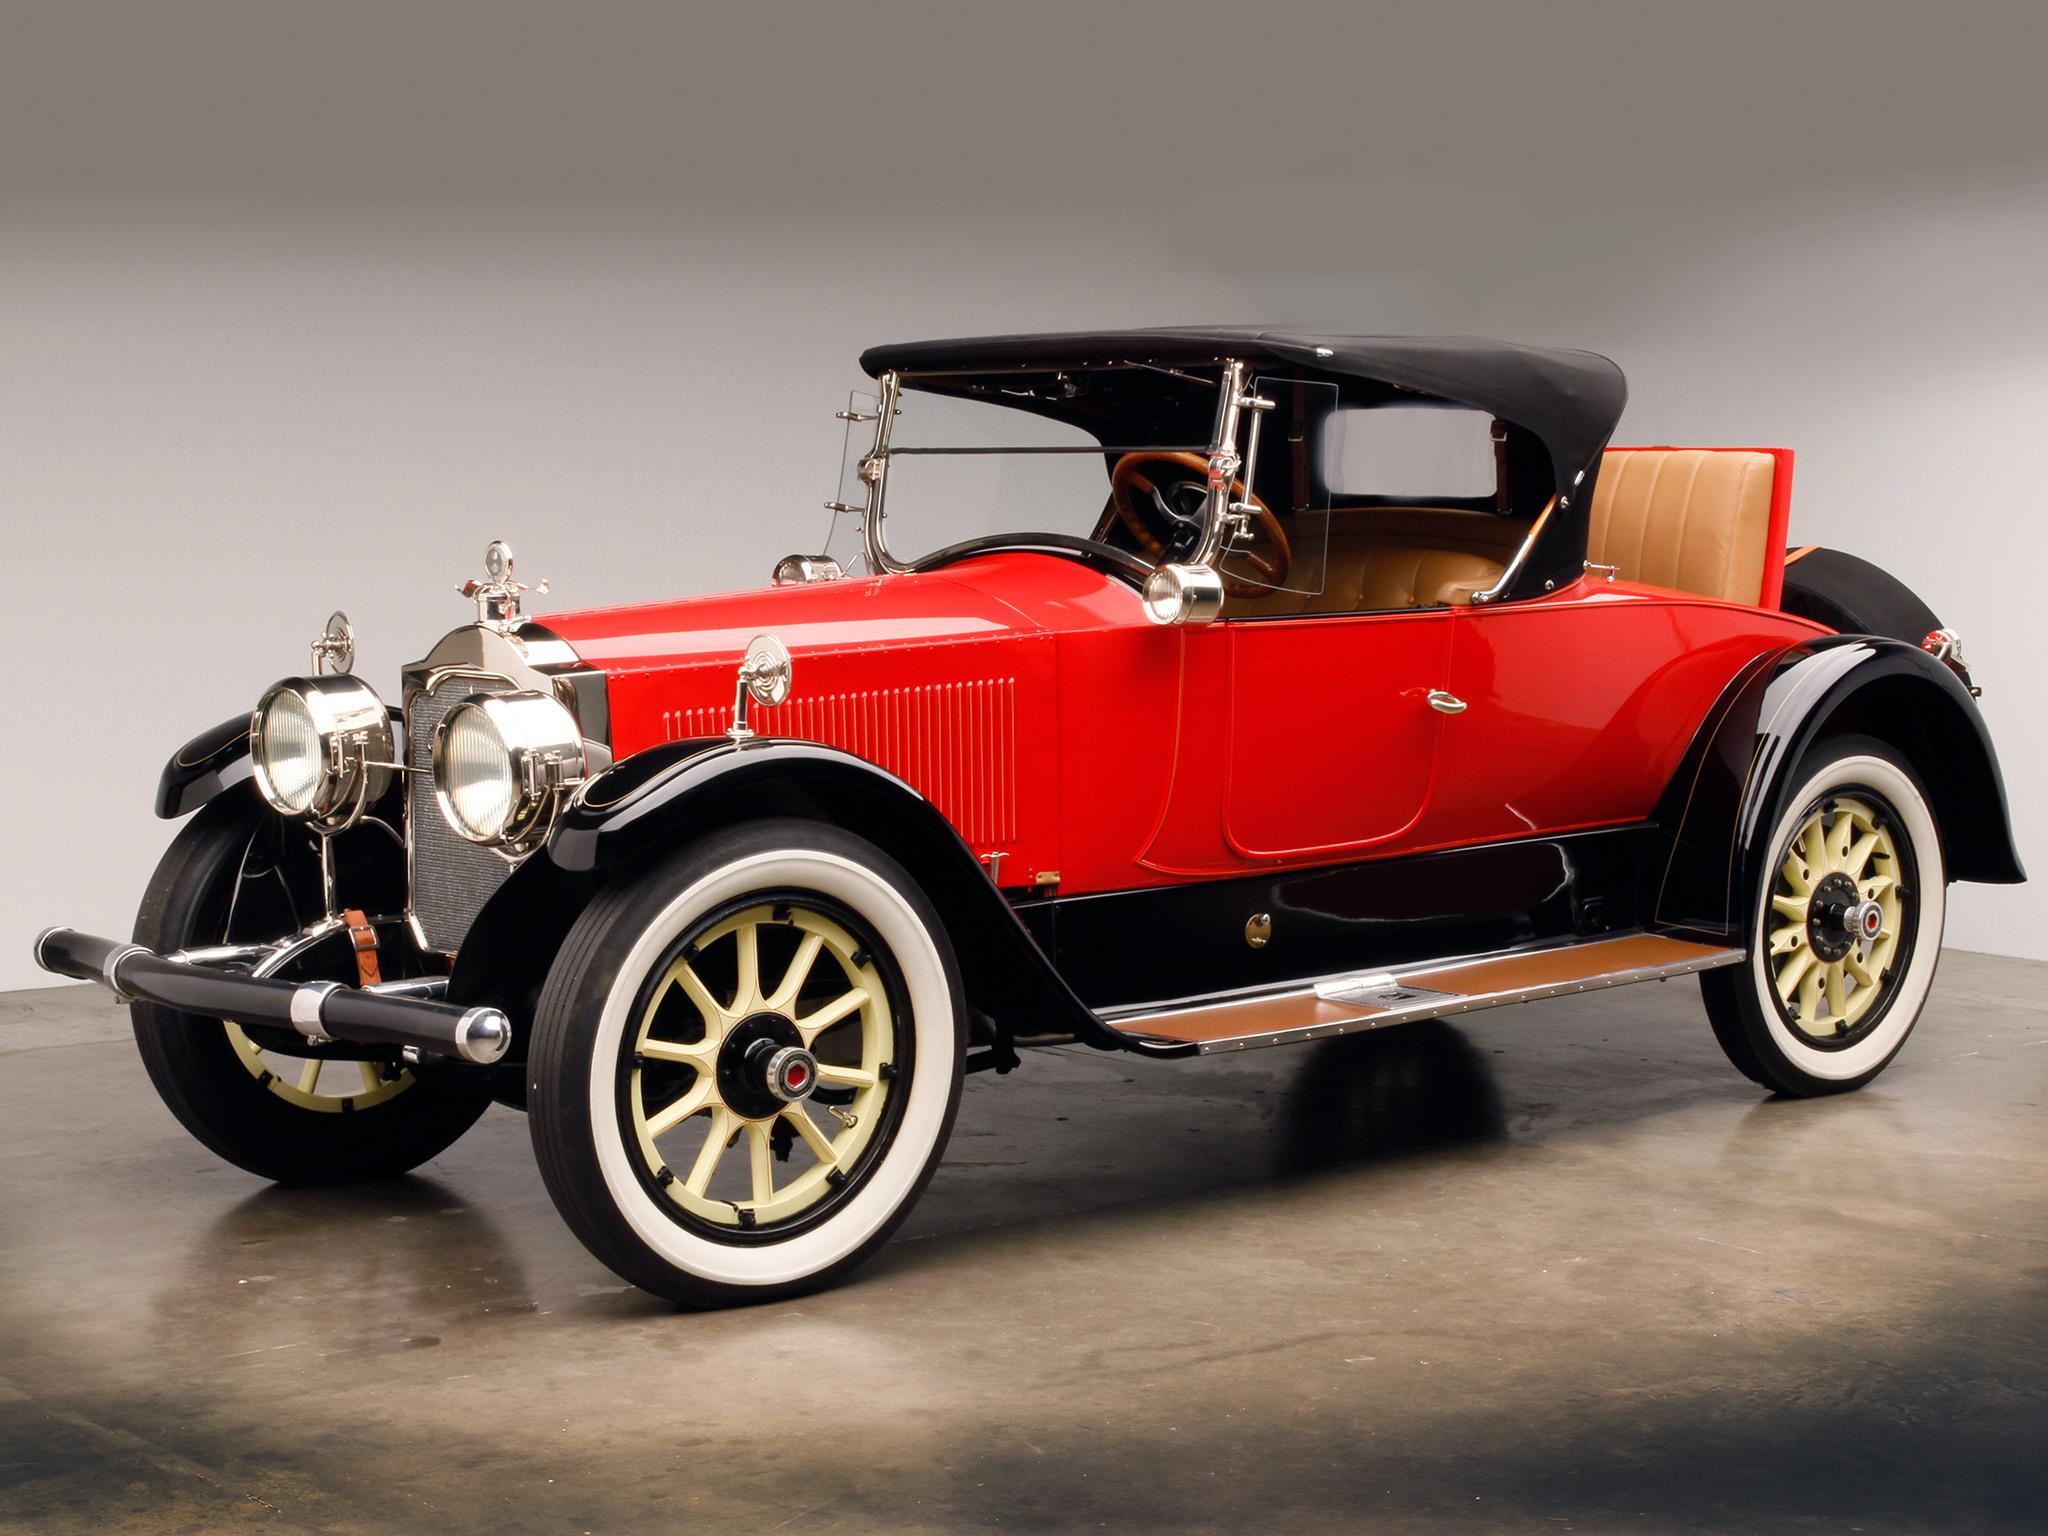 1920 Car: 1920 Packard Twin Six Runabout 3-35 Luxury Retro Wallpaper